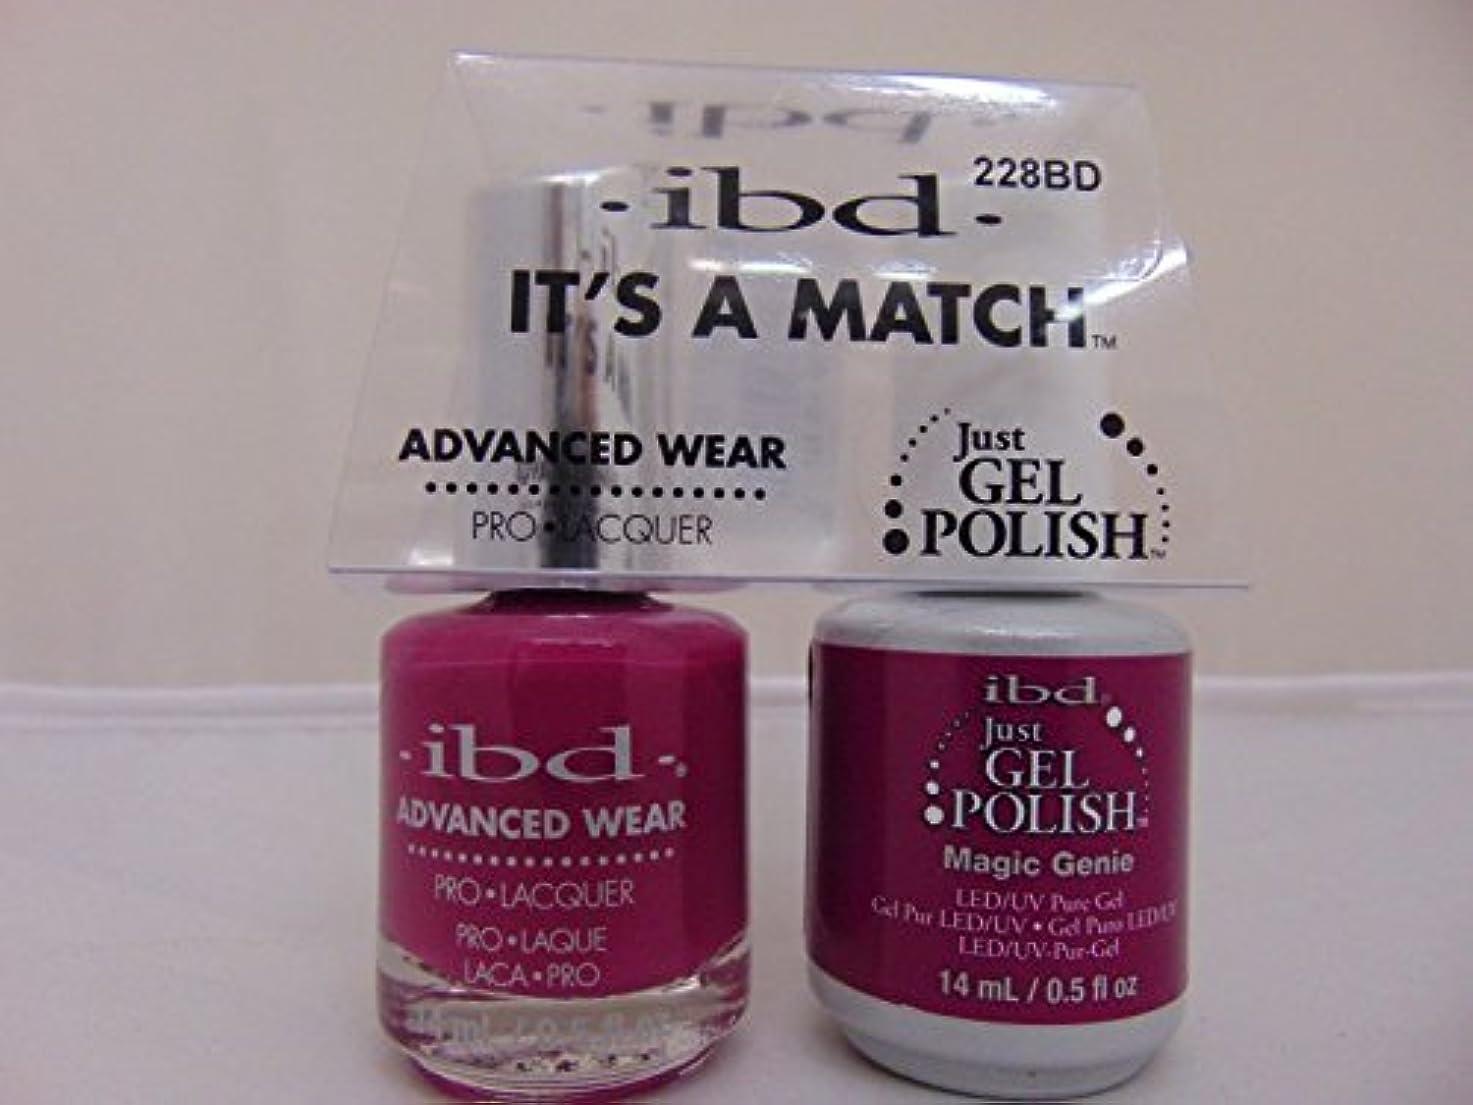 スキーム矢印後方ibd - It's A Match -Duo Pack- Magic Genie - 14 mL / 0.5 oz Each